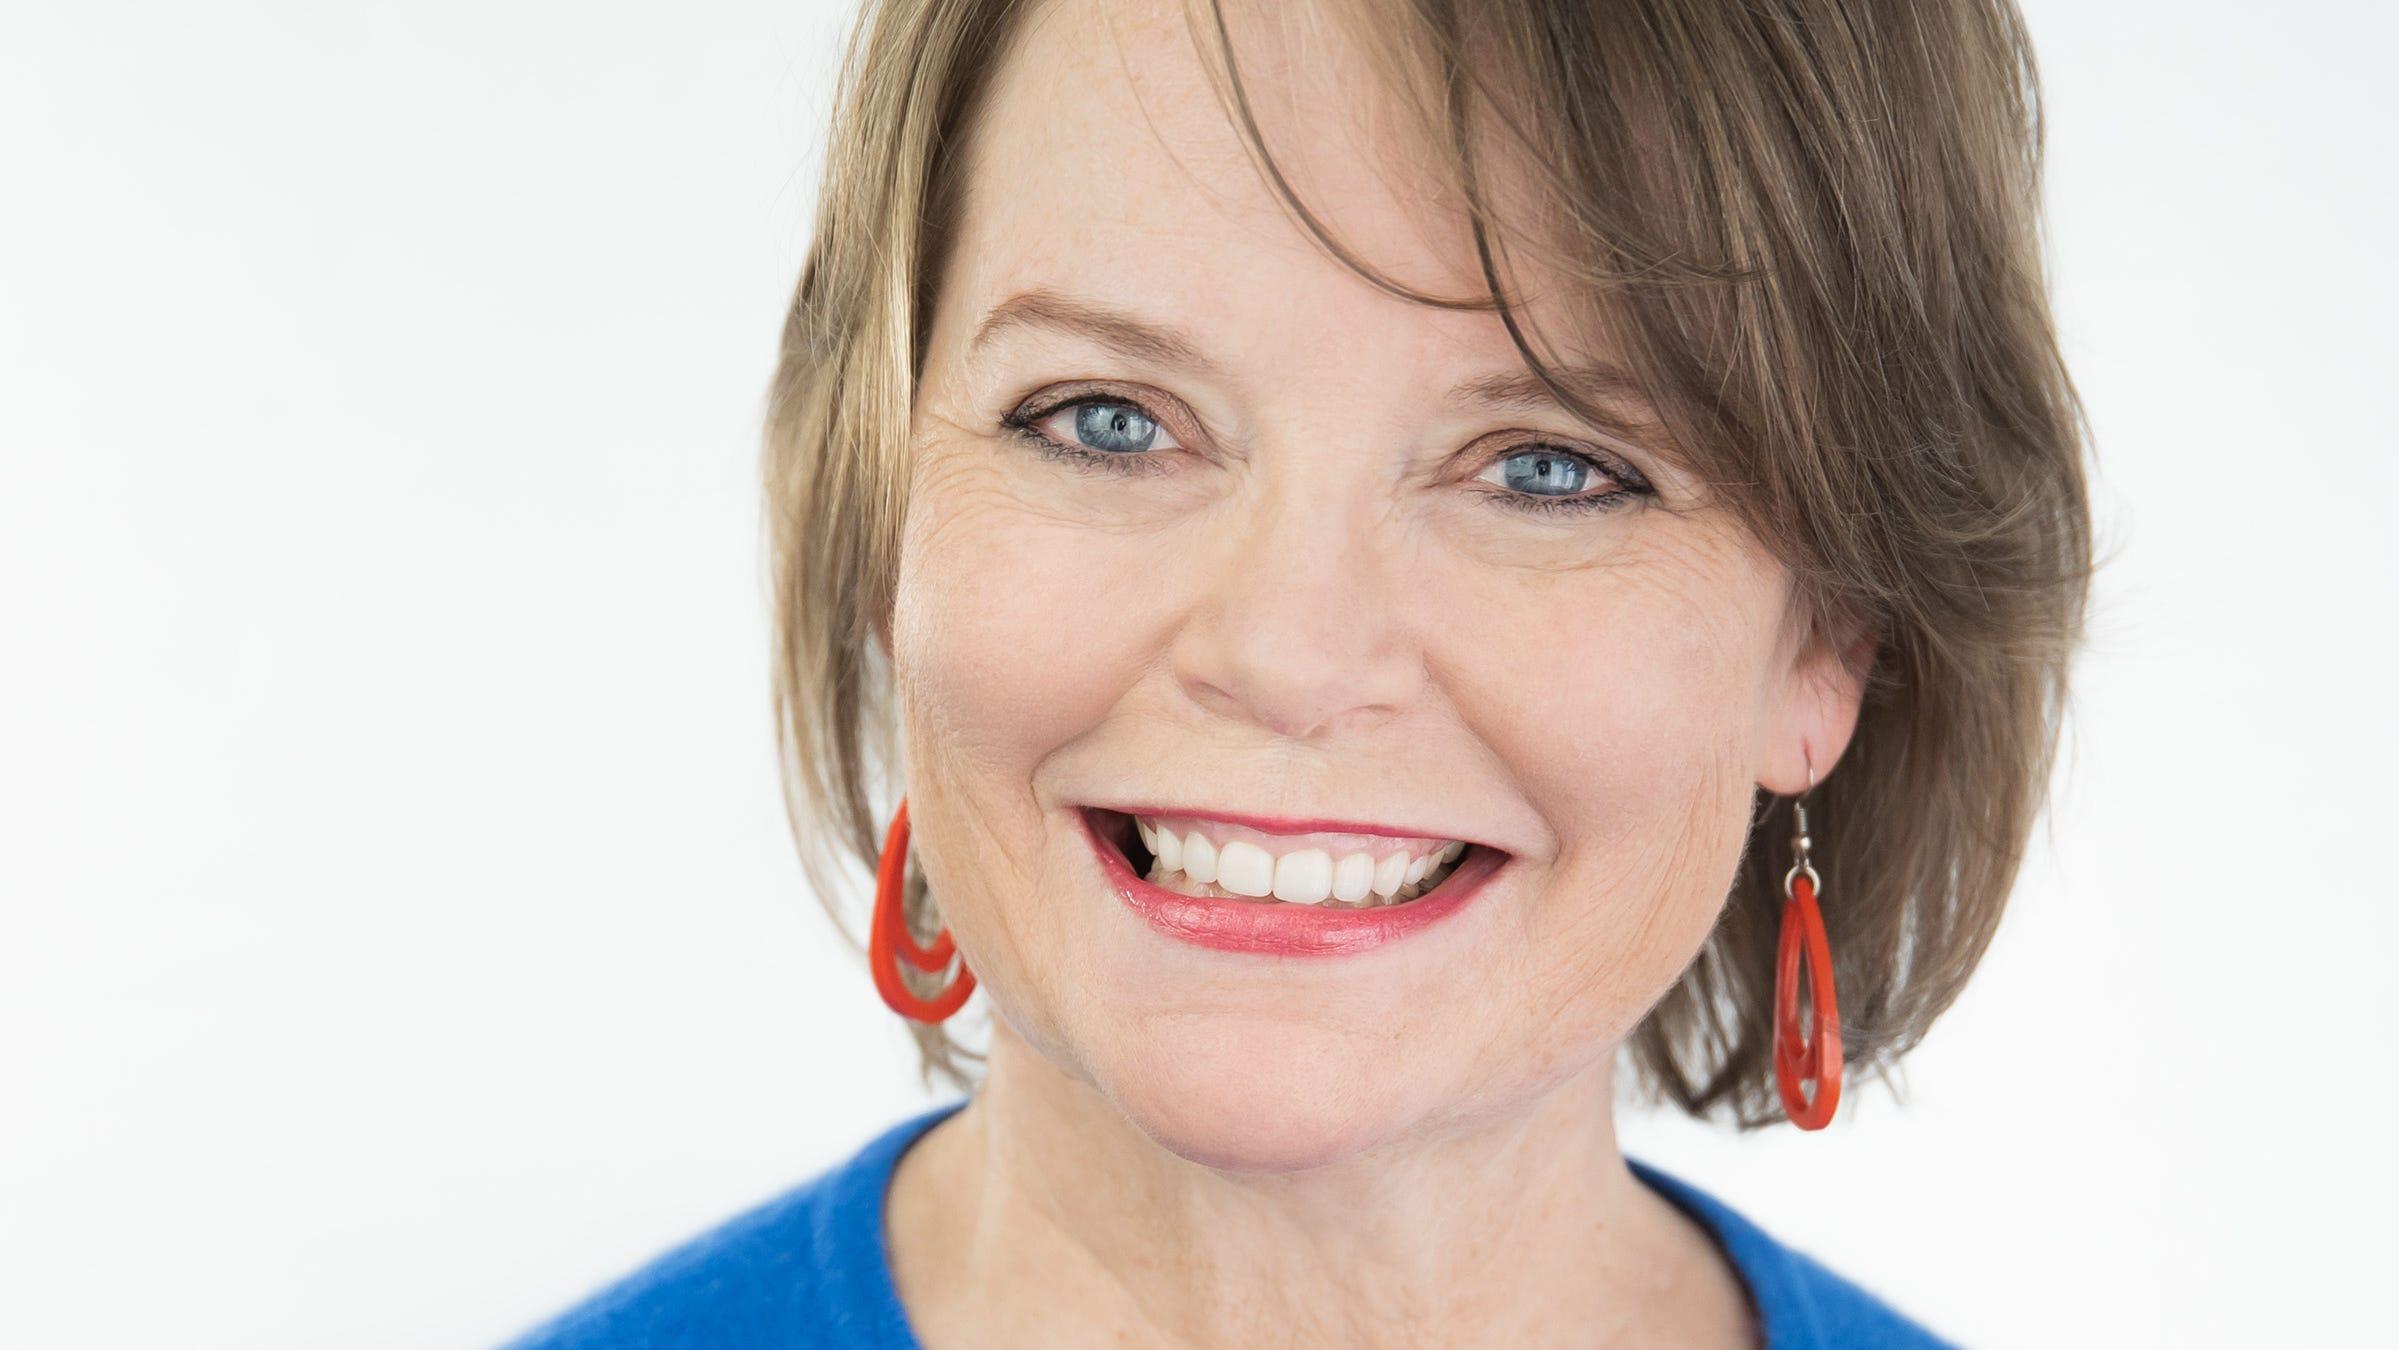 Humor columnist Celia Rivenbark gives her take on sign art